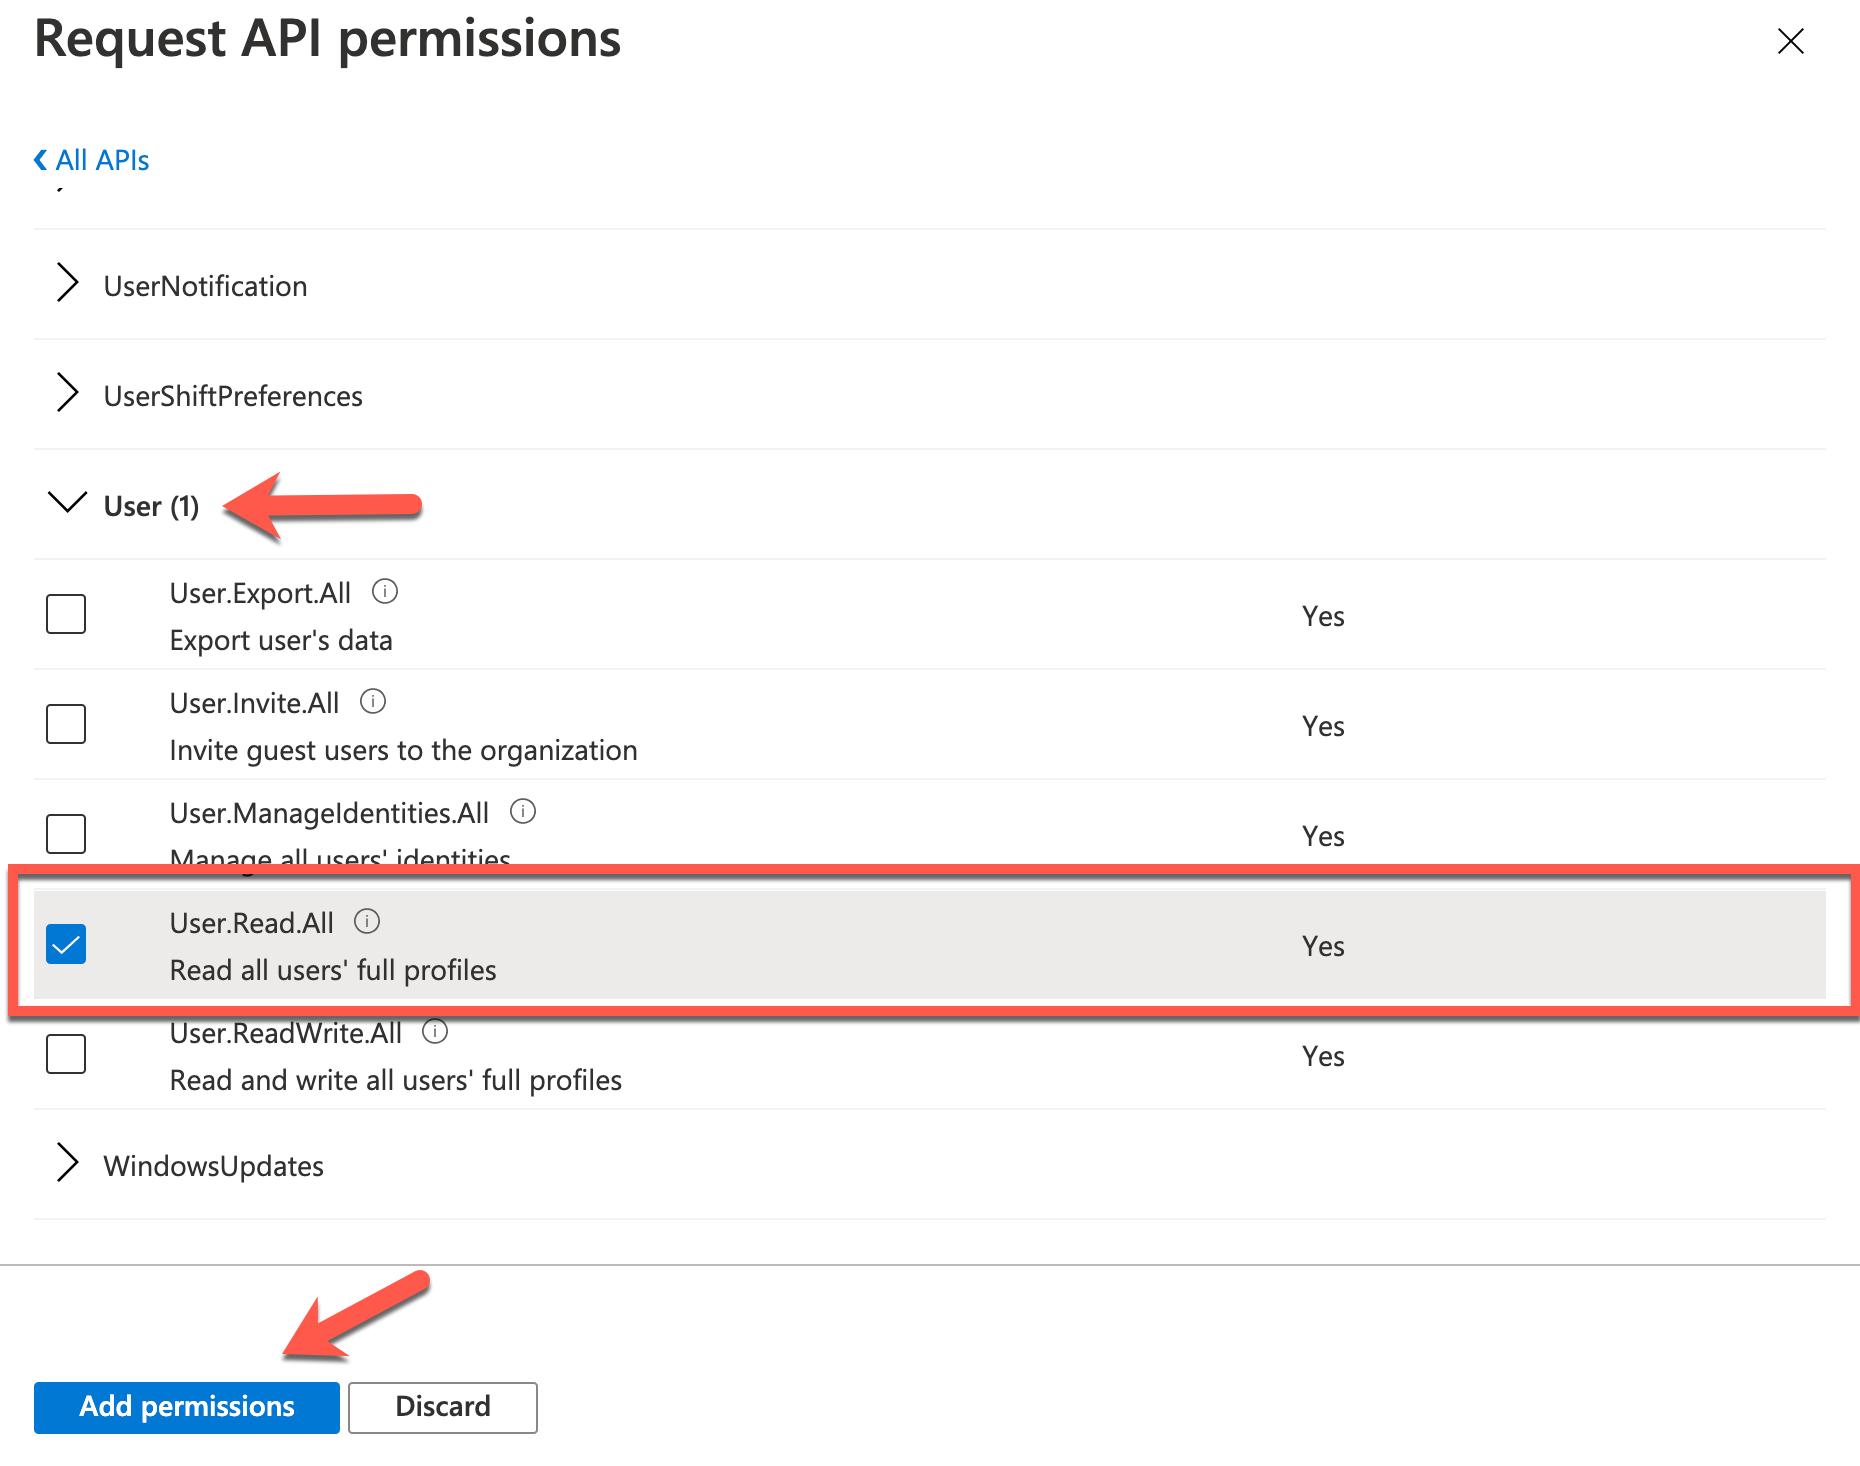 Azure Console - Adding API Permissions (Example permission)